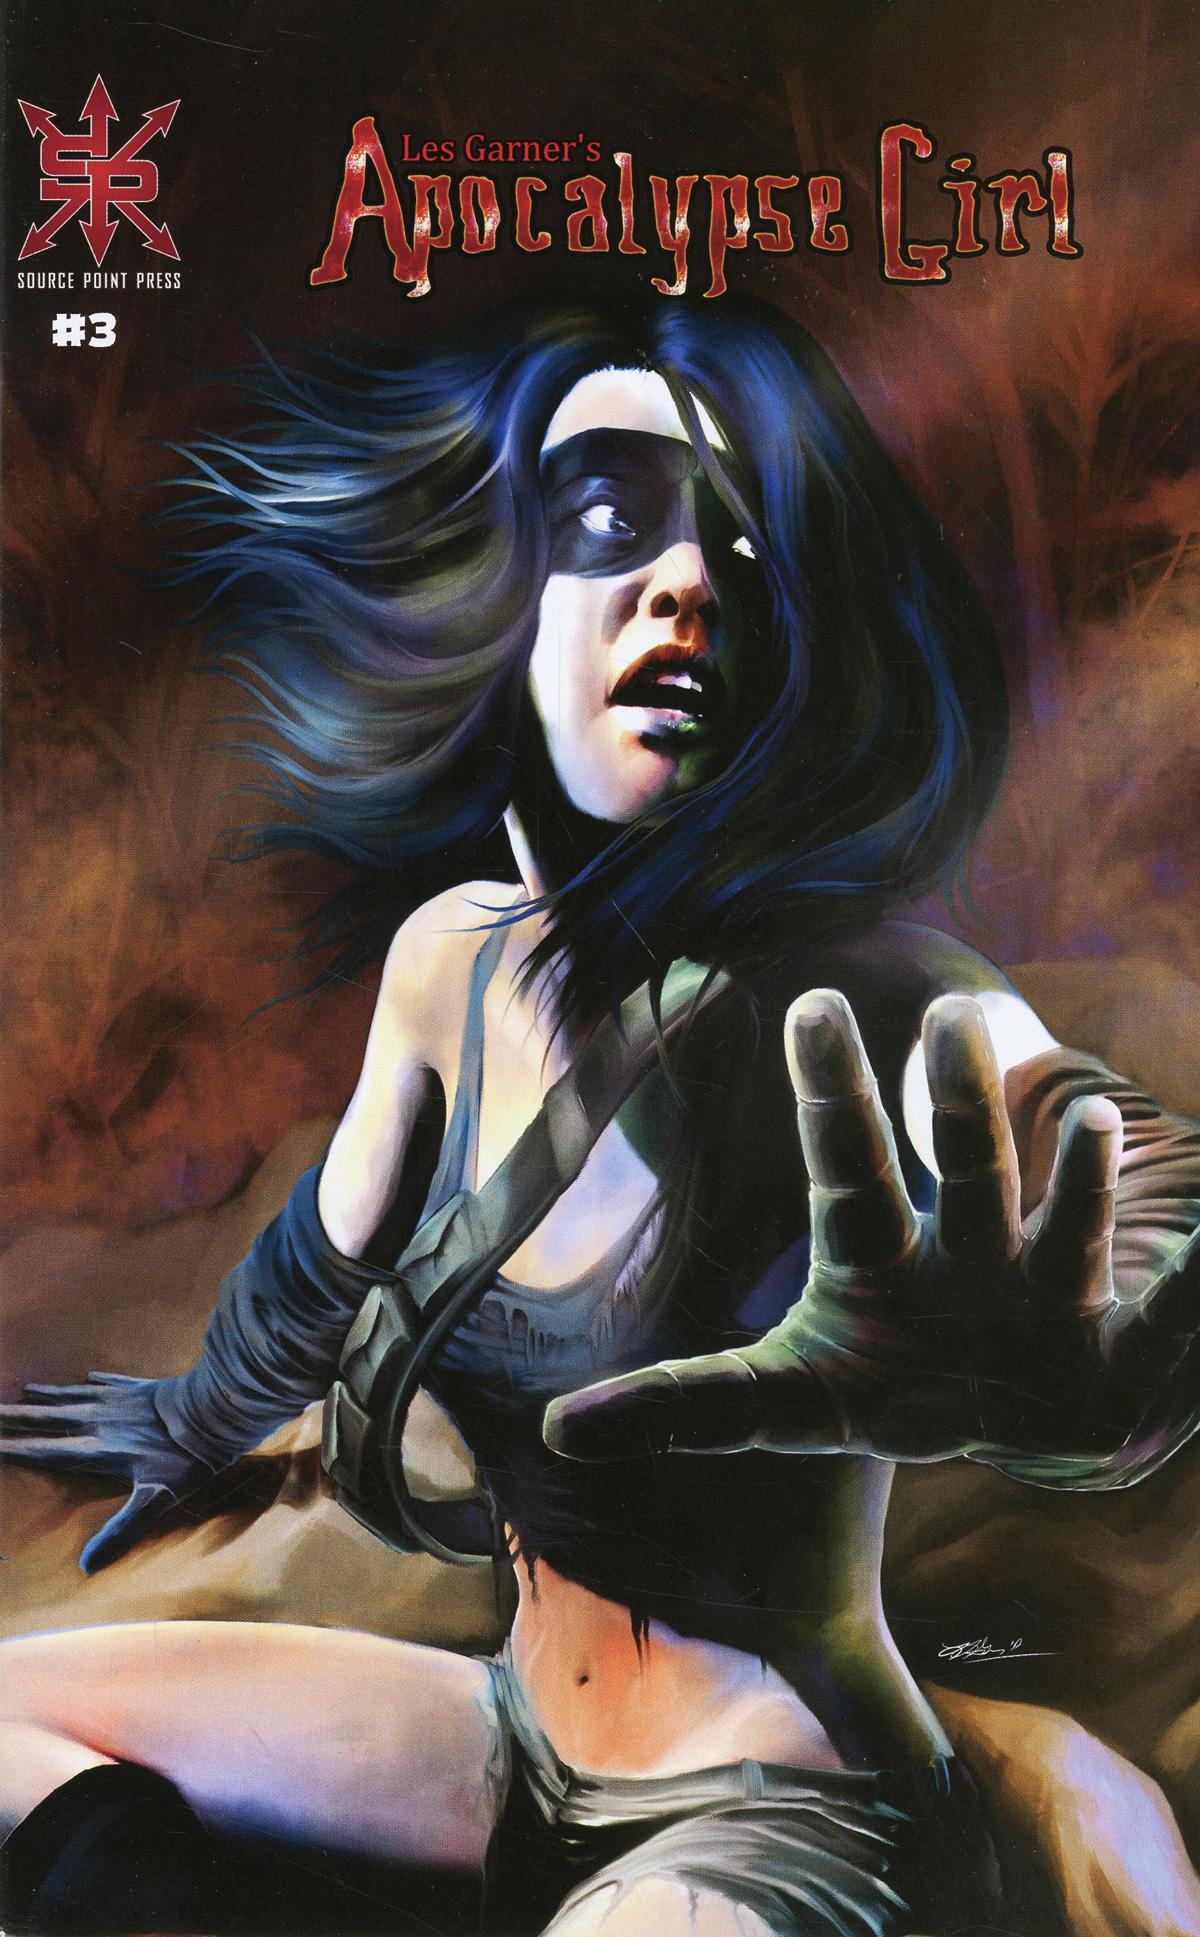 Apocalypse Girl (Source Point Press) #3